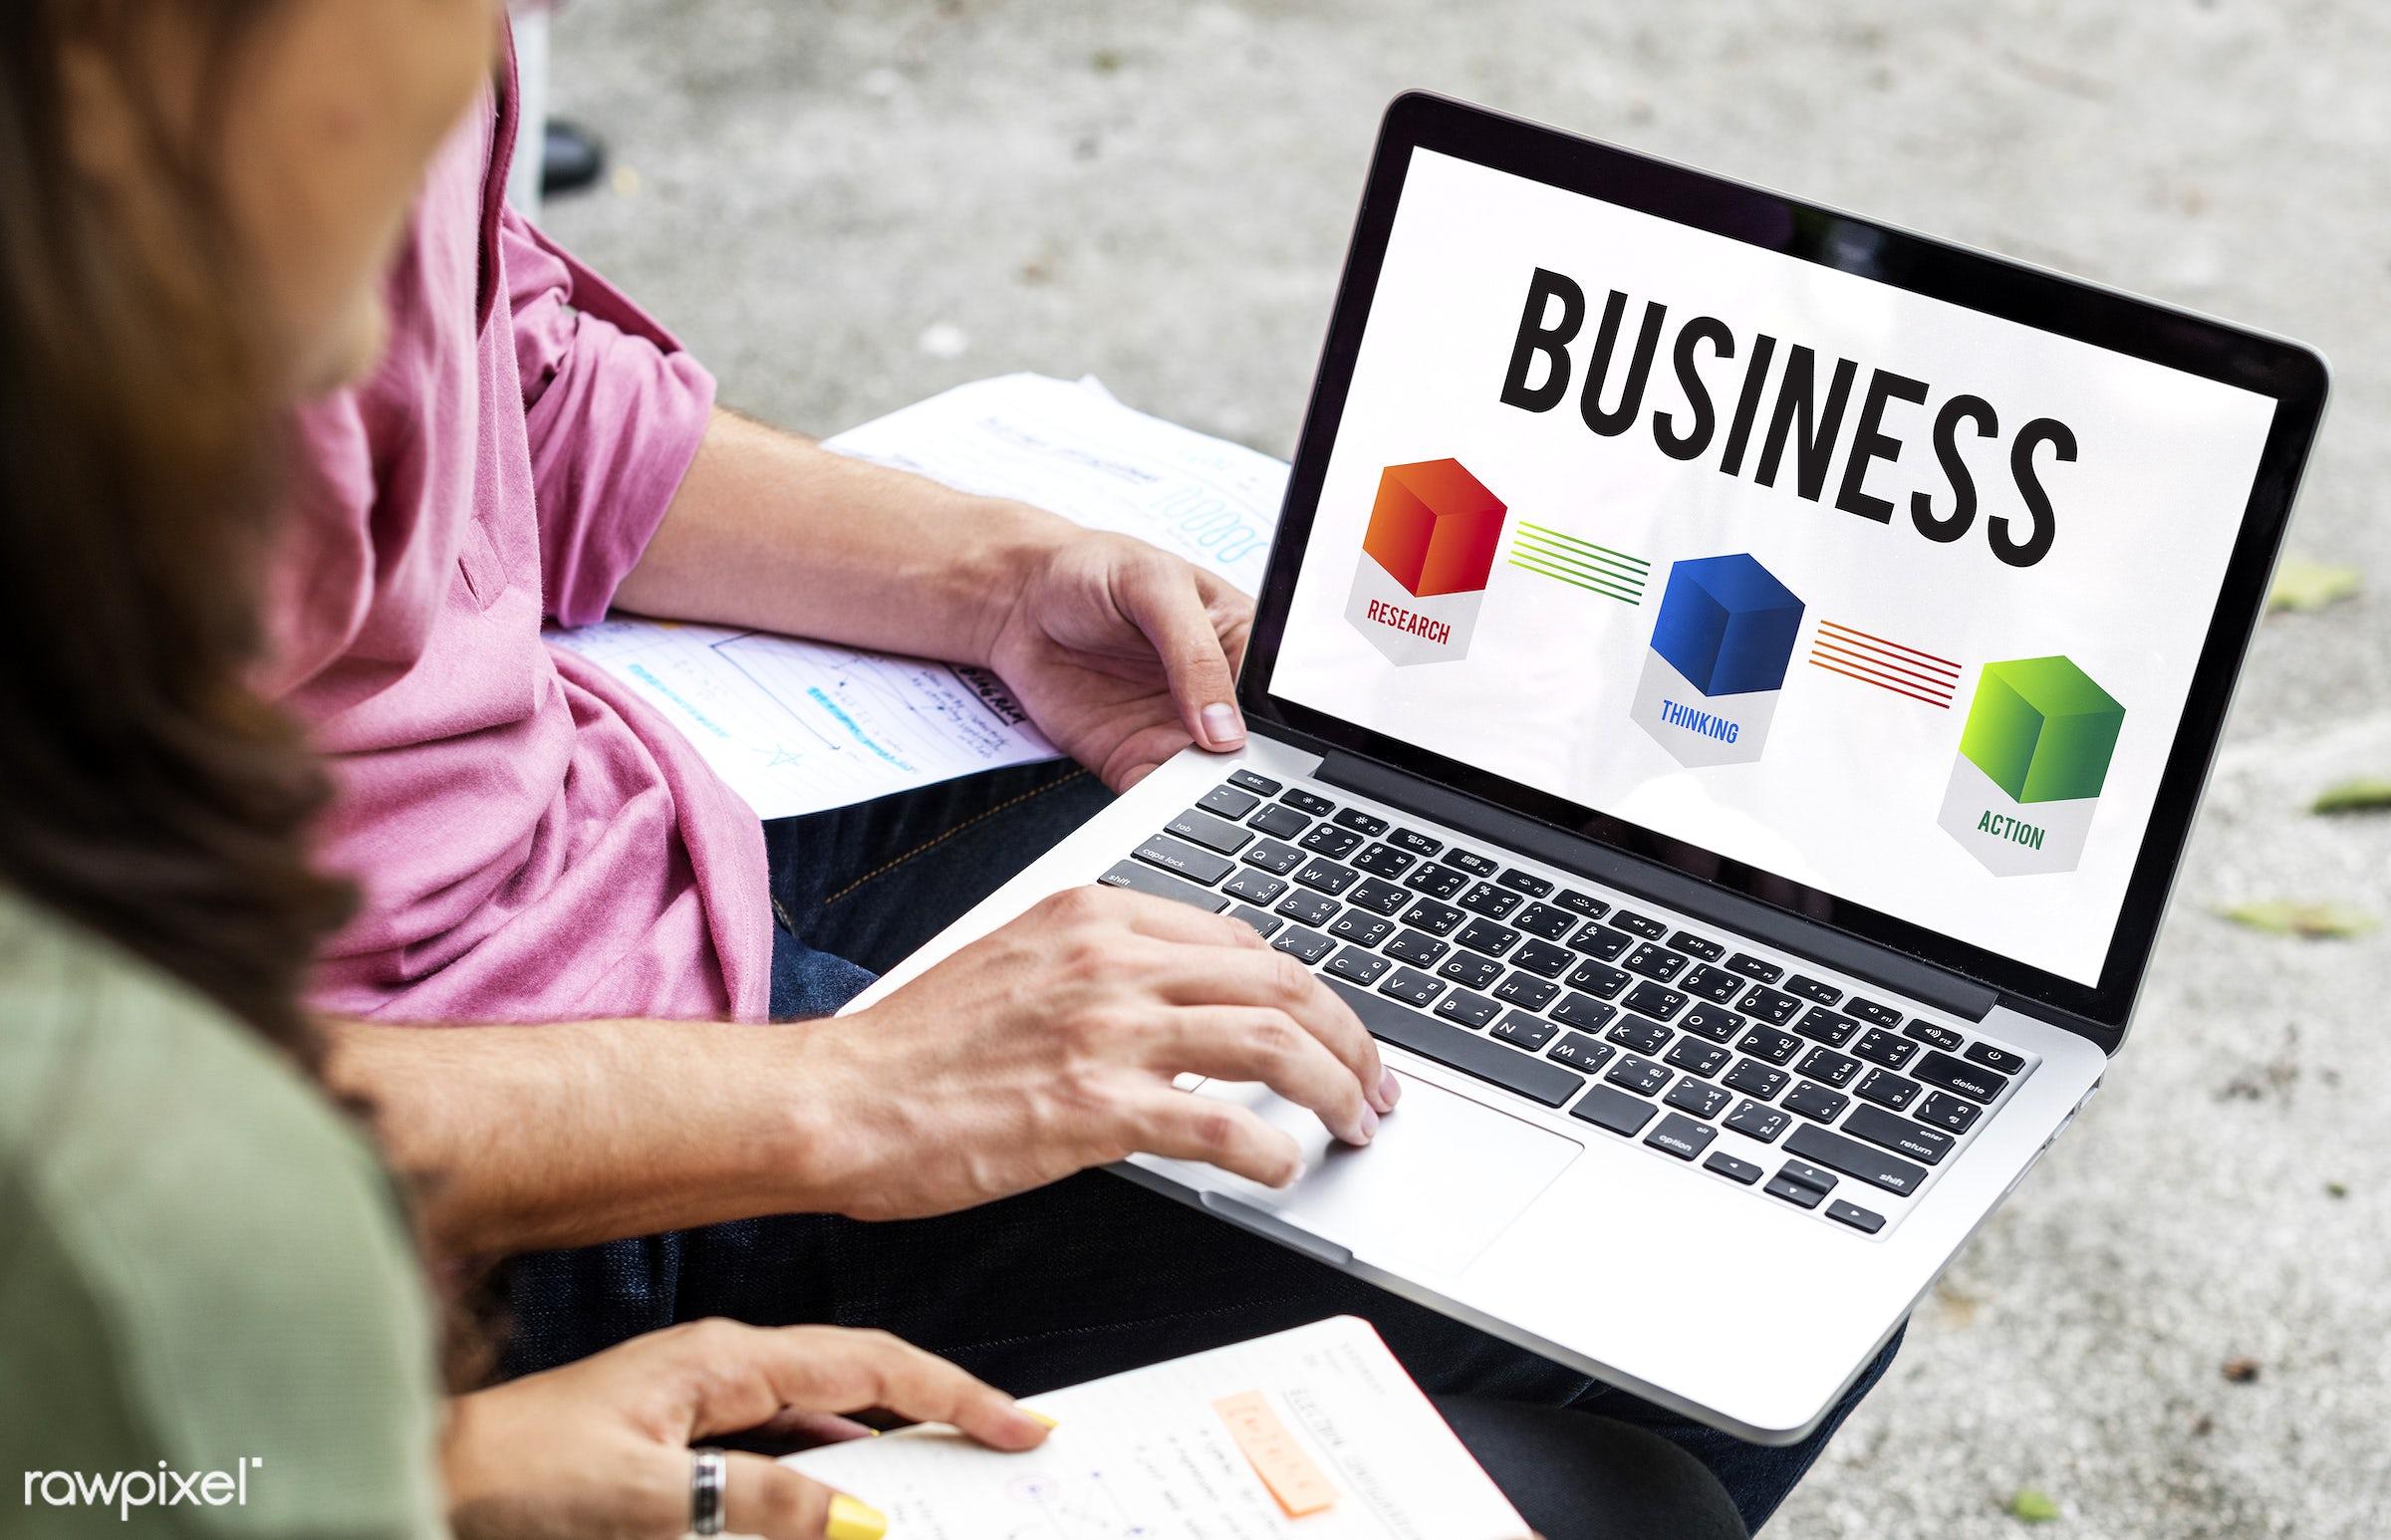 development, action, analysis, asian, browsing, business, caucasian, data, devices, diversity, enjoyment, entrepreneur,...